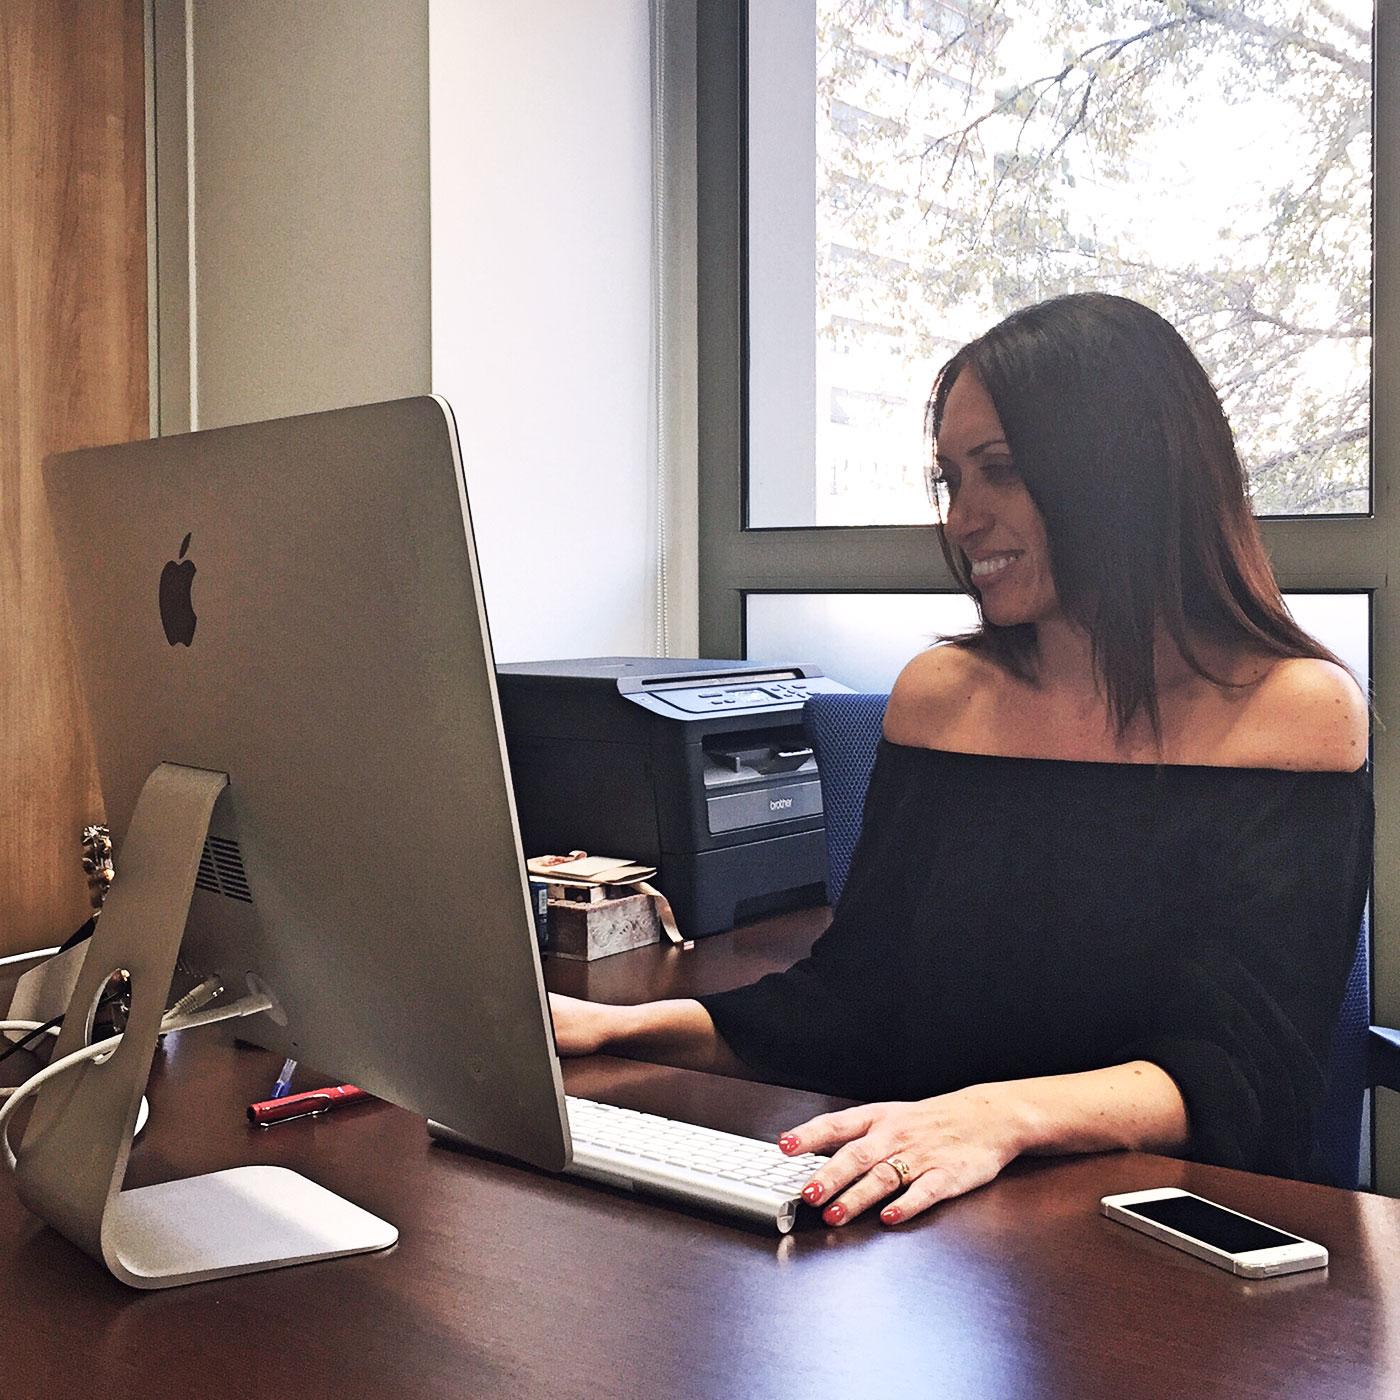 EMMA SESIONES - Sesiones online